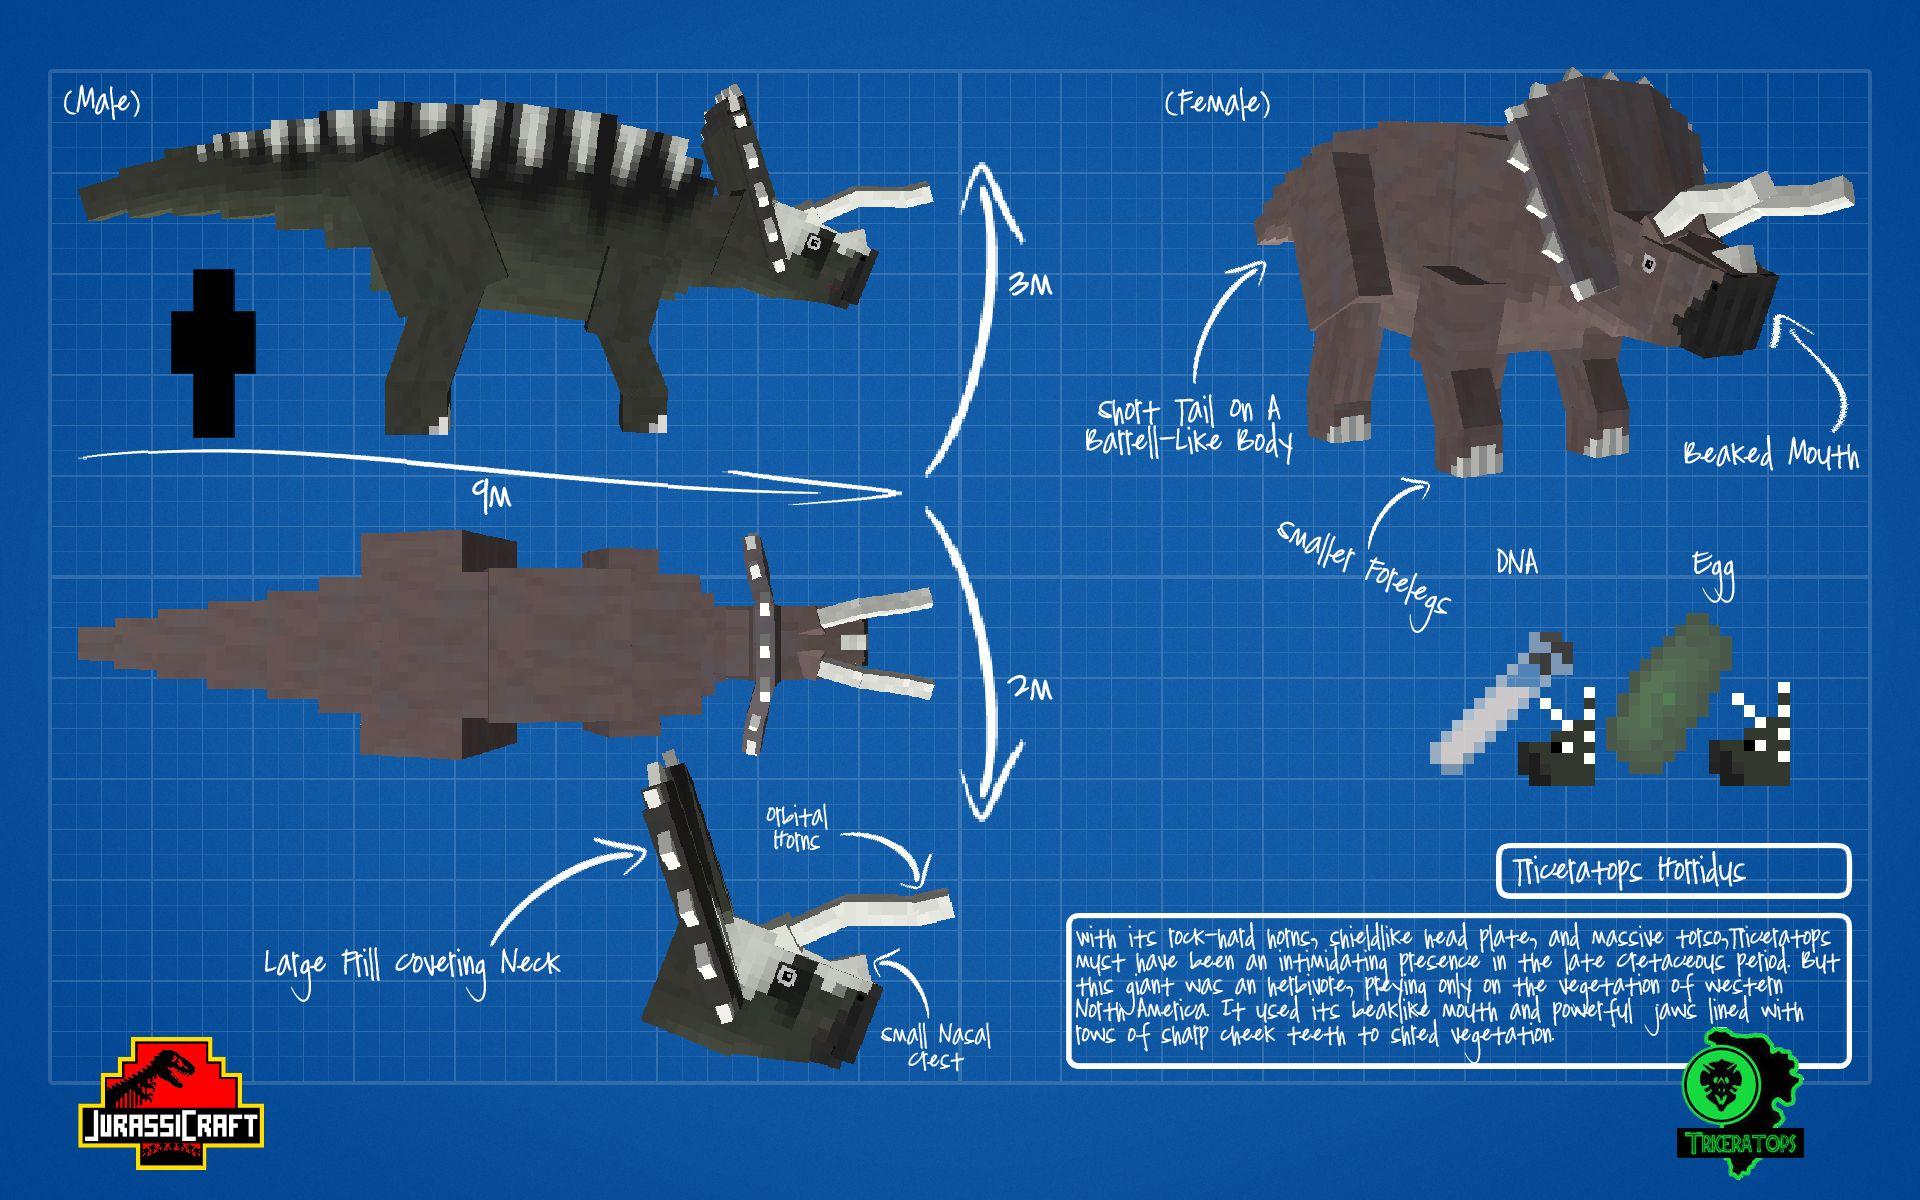 jurassicraft_blueprint____triceratops_by_jurassicraft